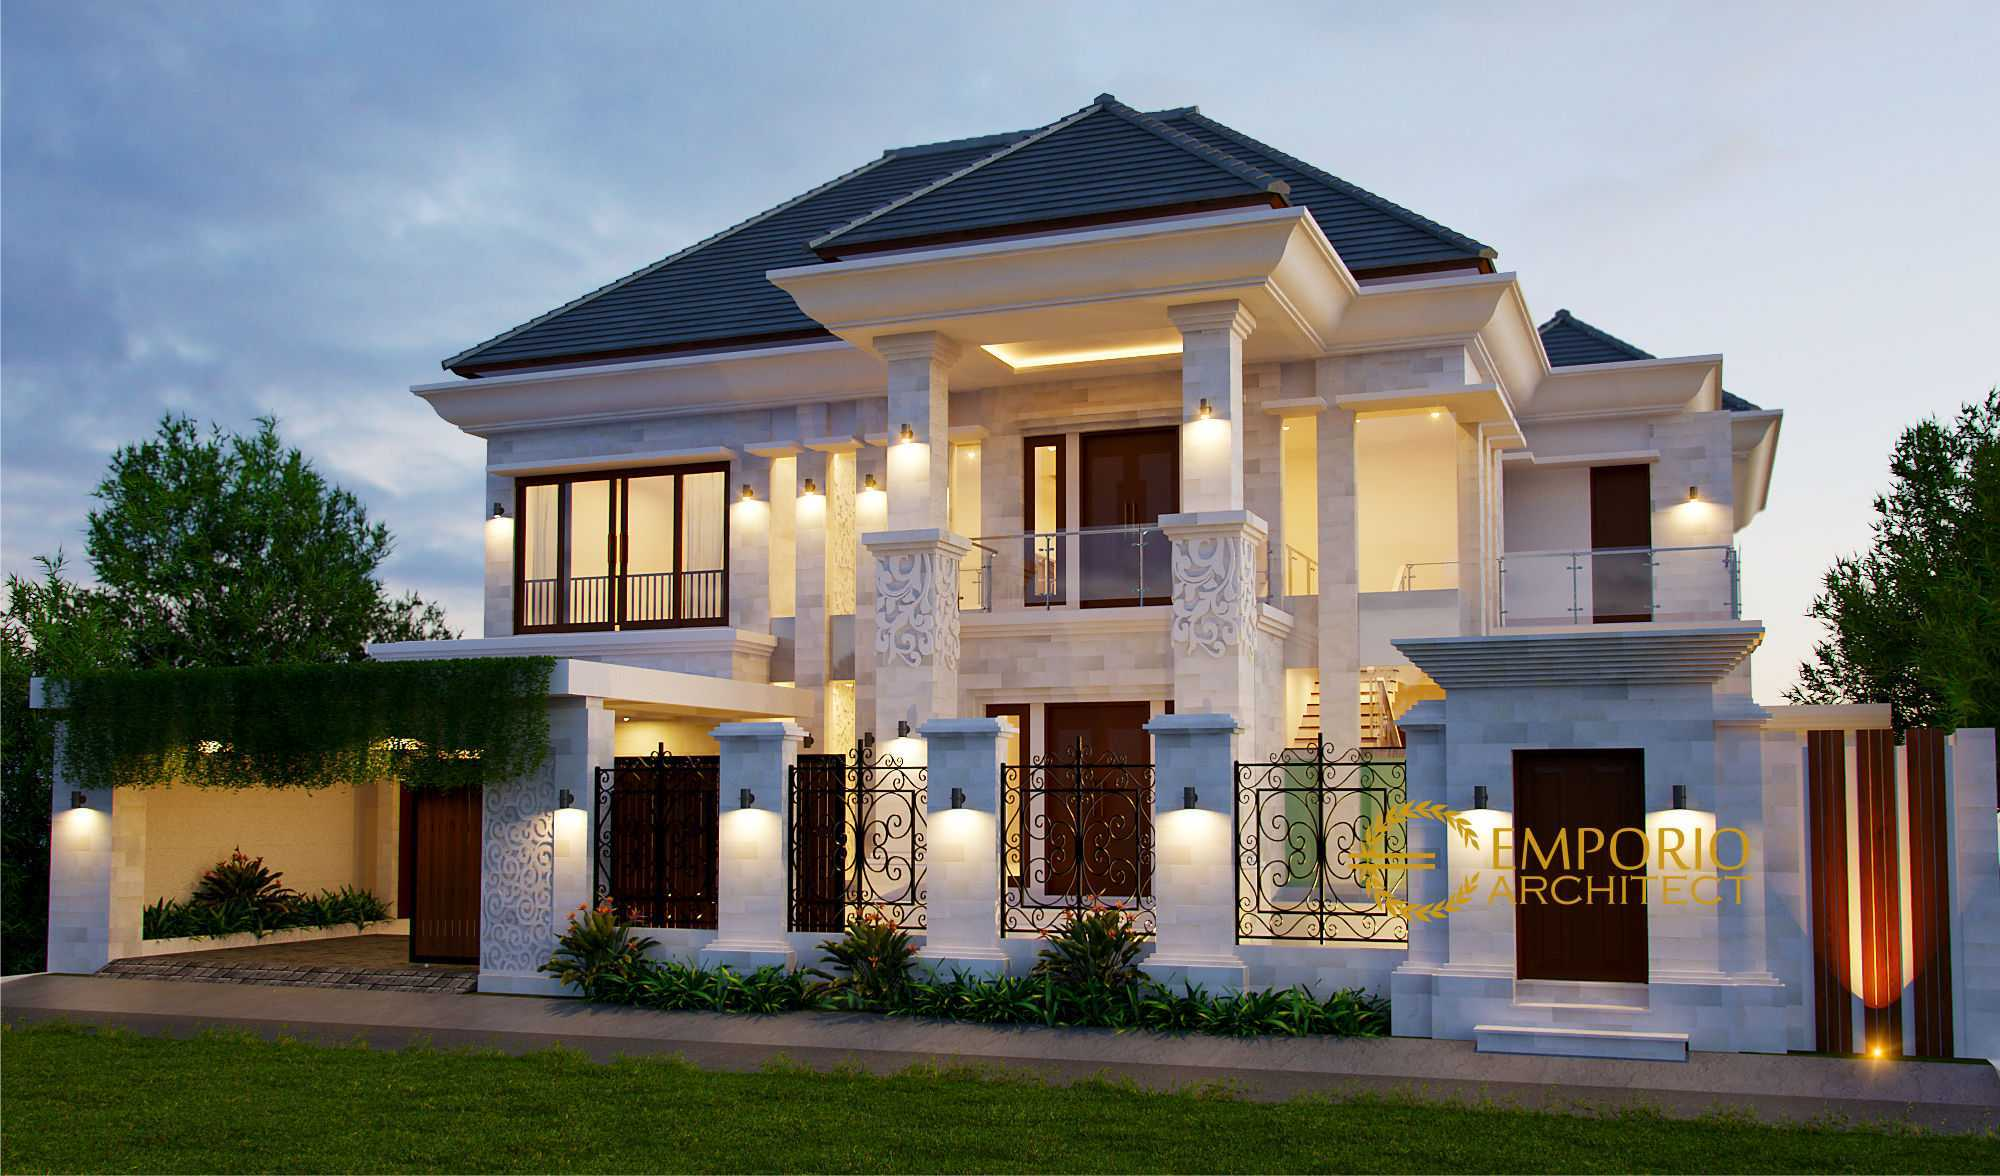 Emporio Architect Jasa Arsitek Denpasar Desain Rumah Villa Bali Tropis 216 @ Denpasar, Bali Kota Denpasar, Bali, Indonesia Kota Denpasar, Bali, Indonesia Emporio-Architect-Jasa-Arsitek-Denpasar-Desain-Rumah-Villa-Bali-Tropis-216-Denpasar-Bali Tropical 84008